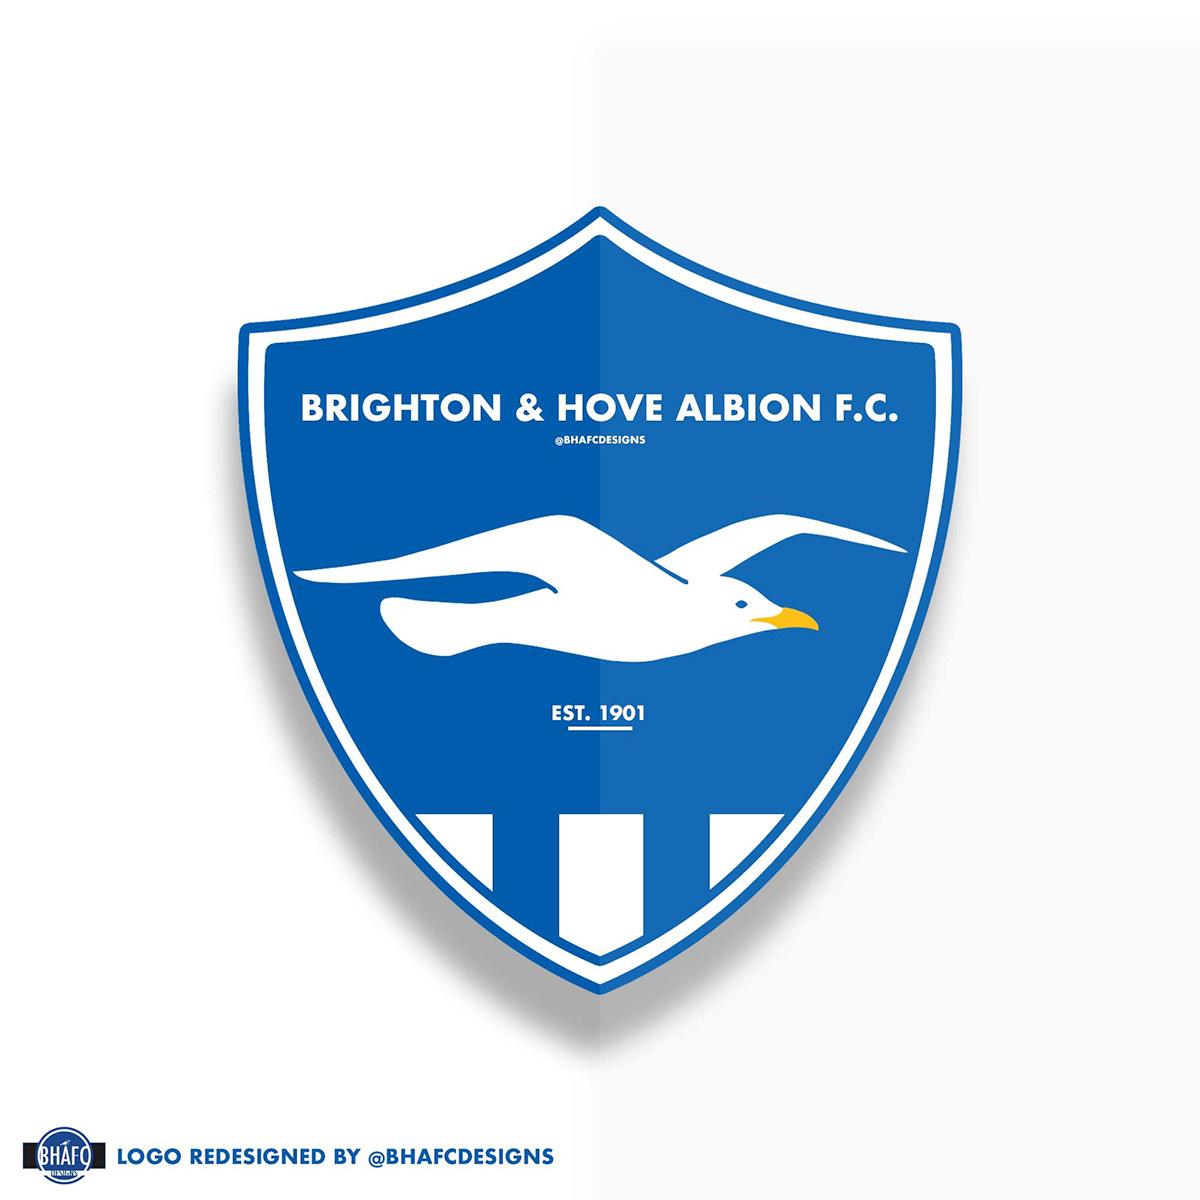 brighton hove albion f c logo redesign on behance